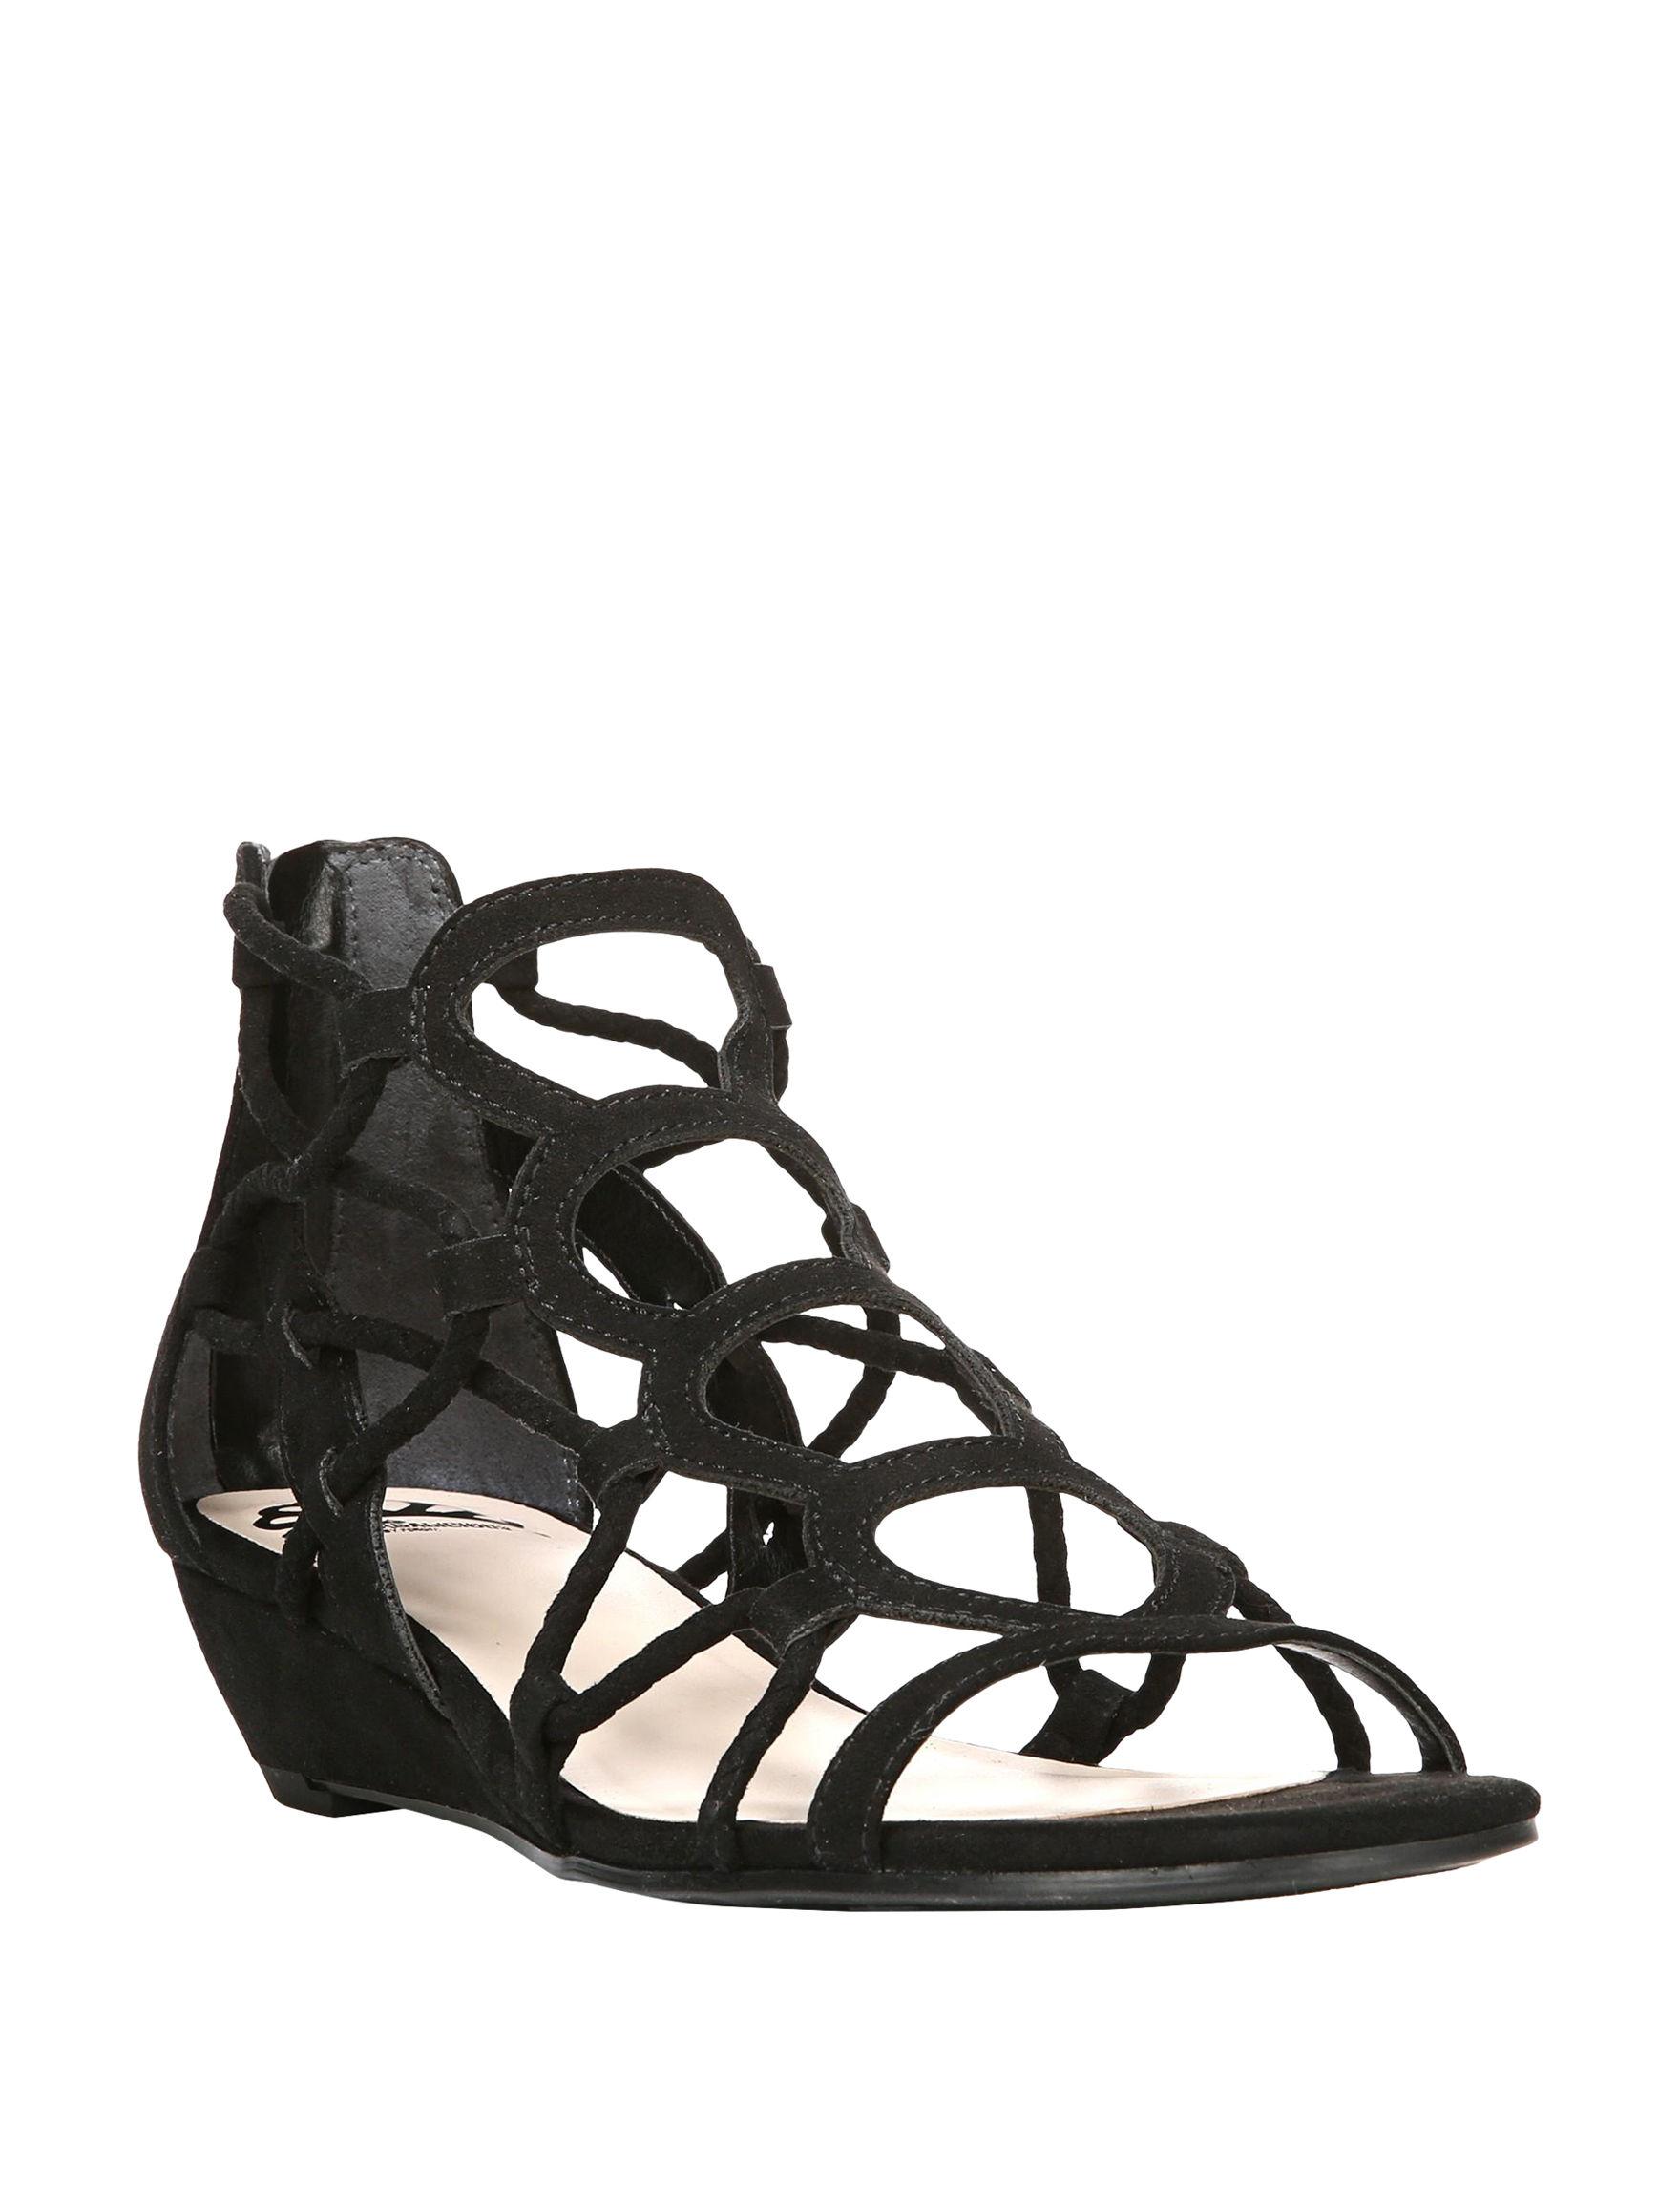 Fergalicious by Fergie Black Flat Sandals Gladiators